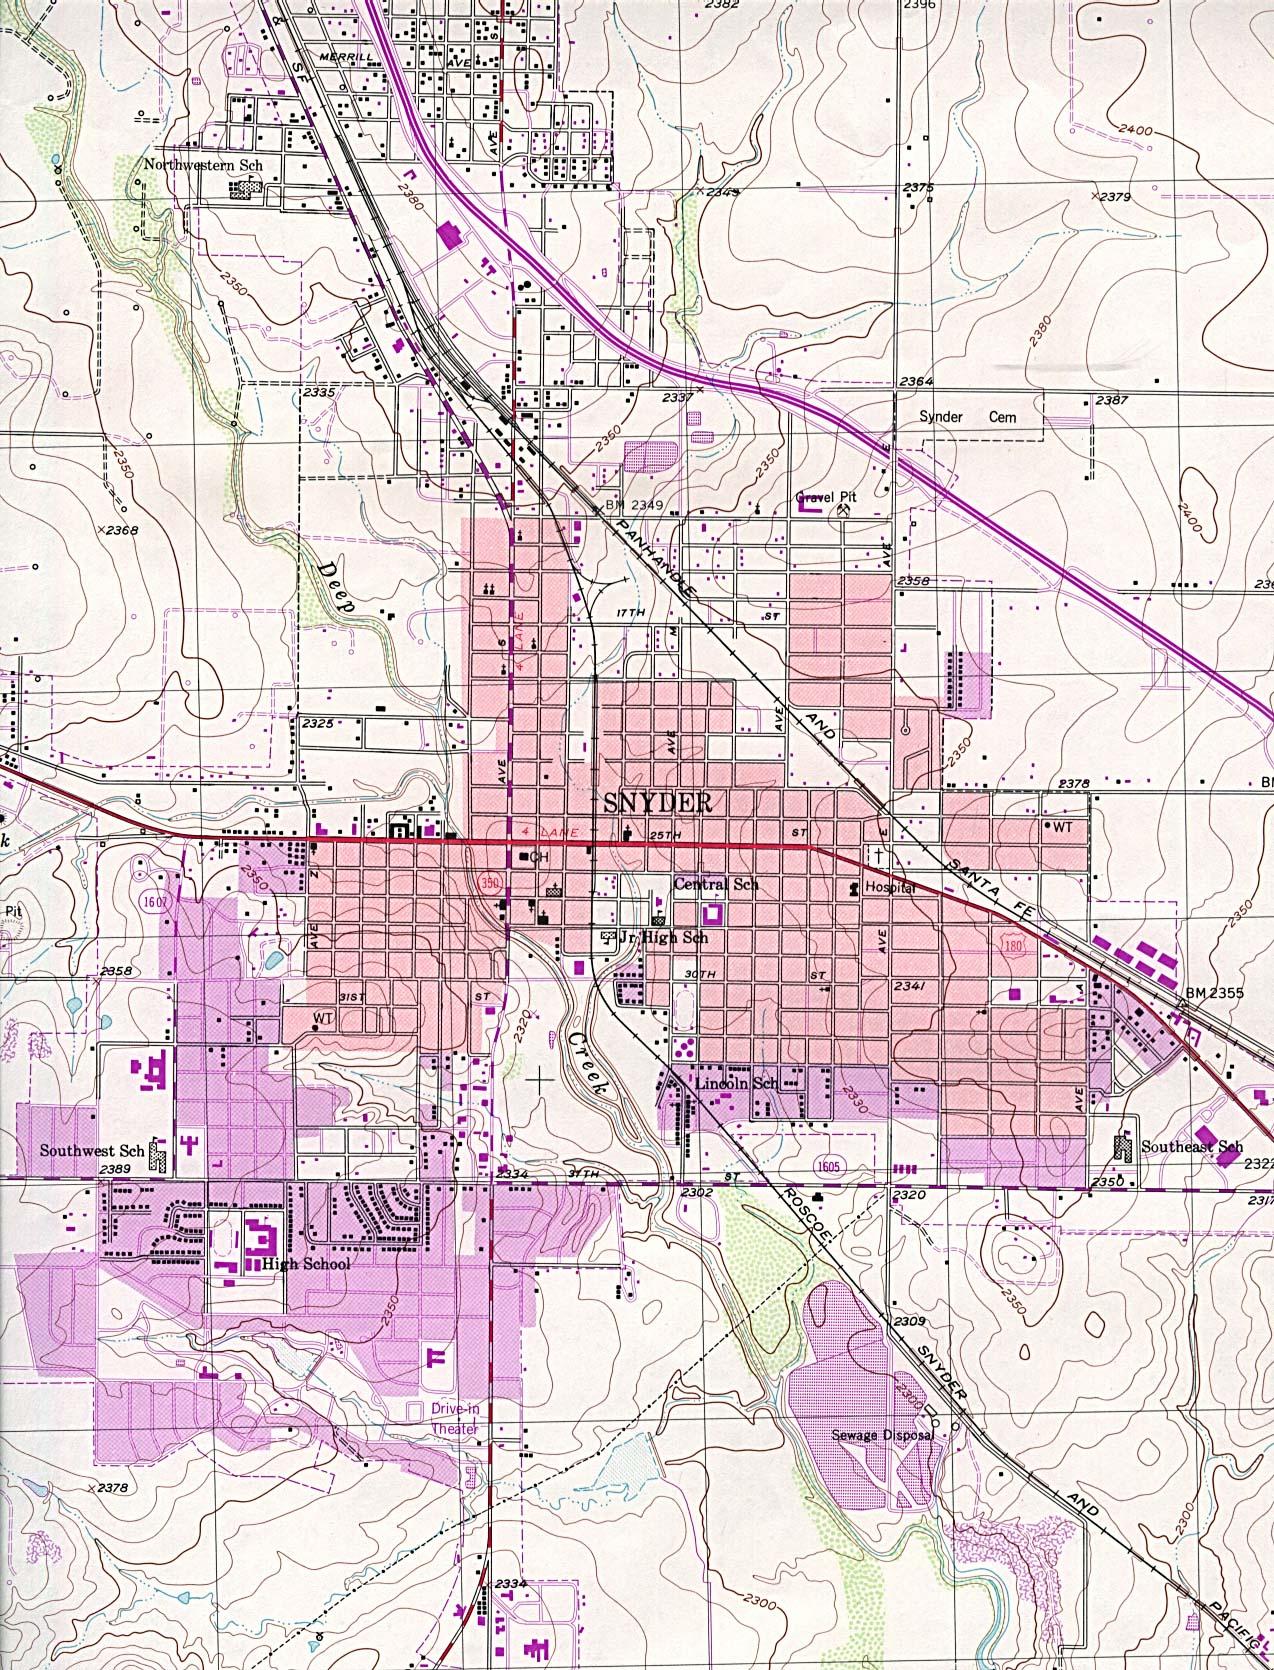 Texas City Maps - Perry-Castañeda Map Collection - Ut Library Online - Seguin Texas Map